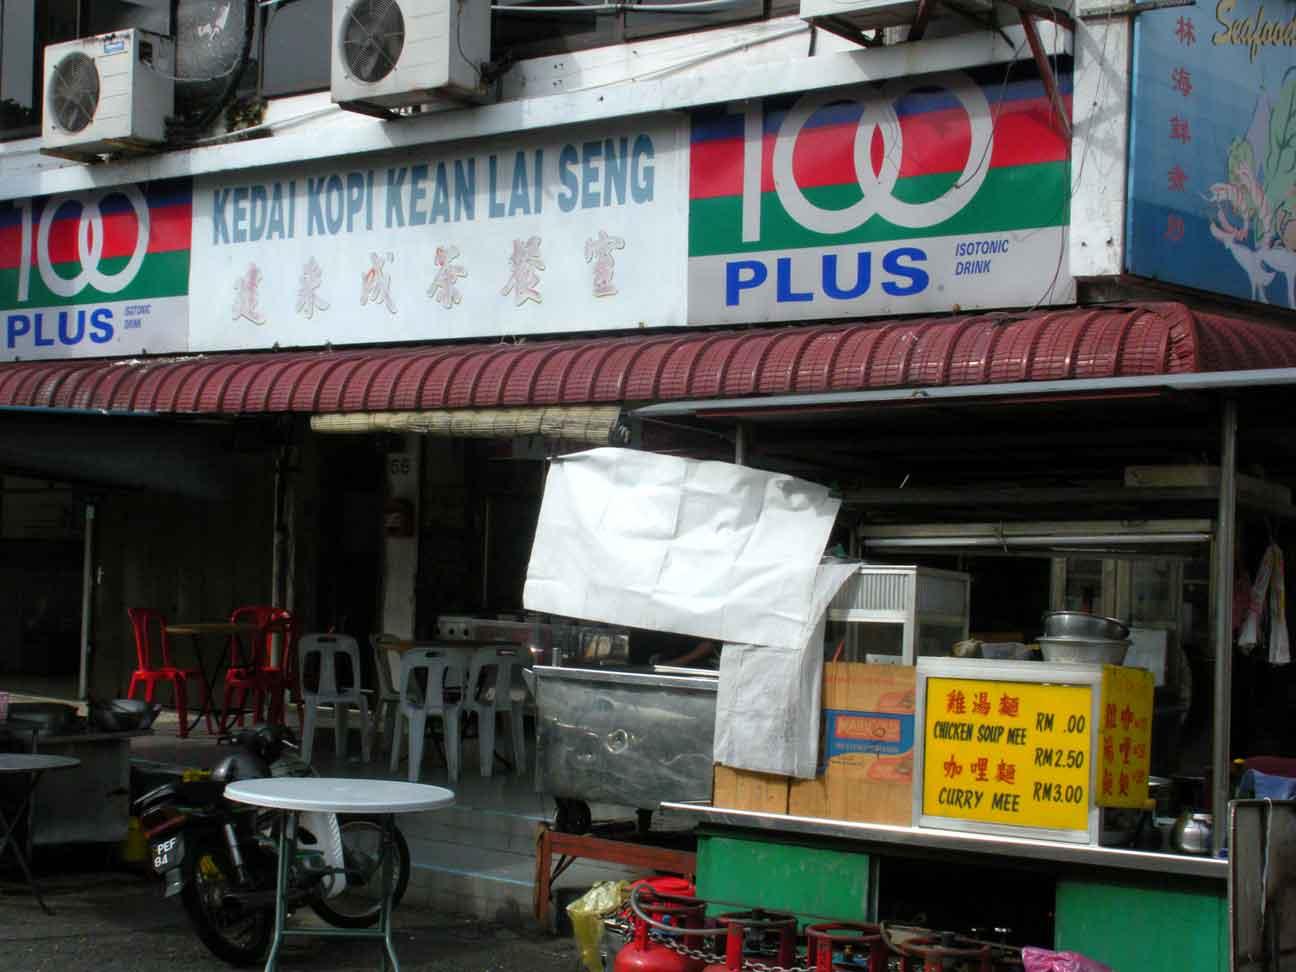 Kampung Malabar Curry Mee stall